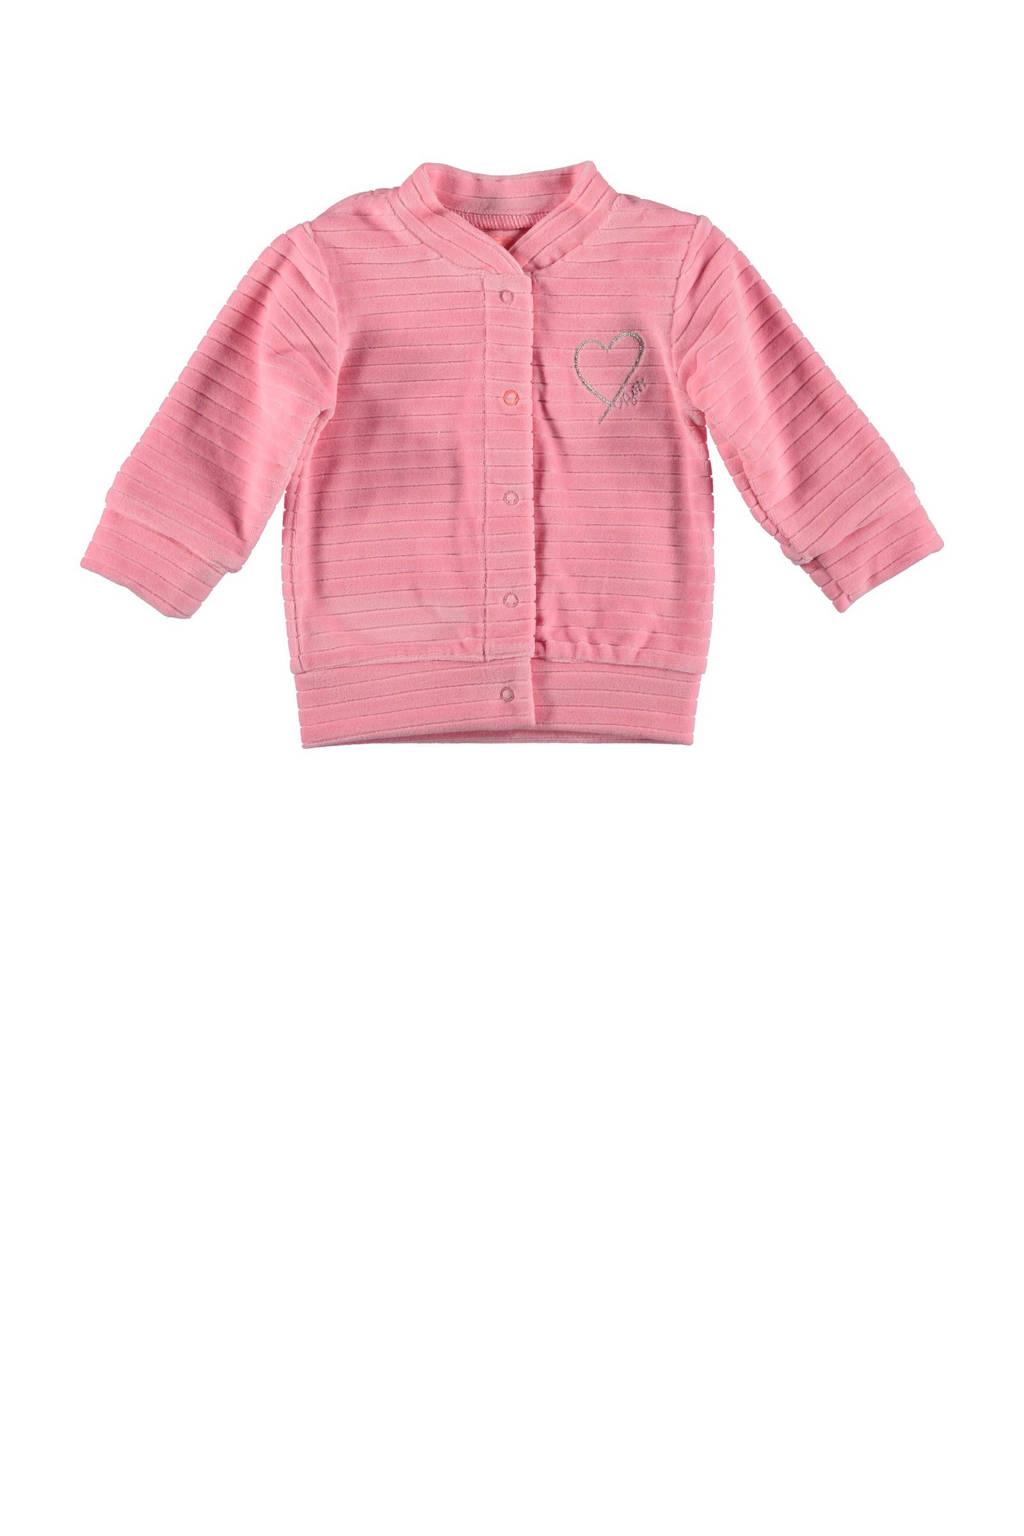 B.E.S.S baby gestreept fluwelen vest roze, Roze